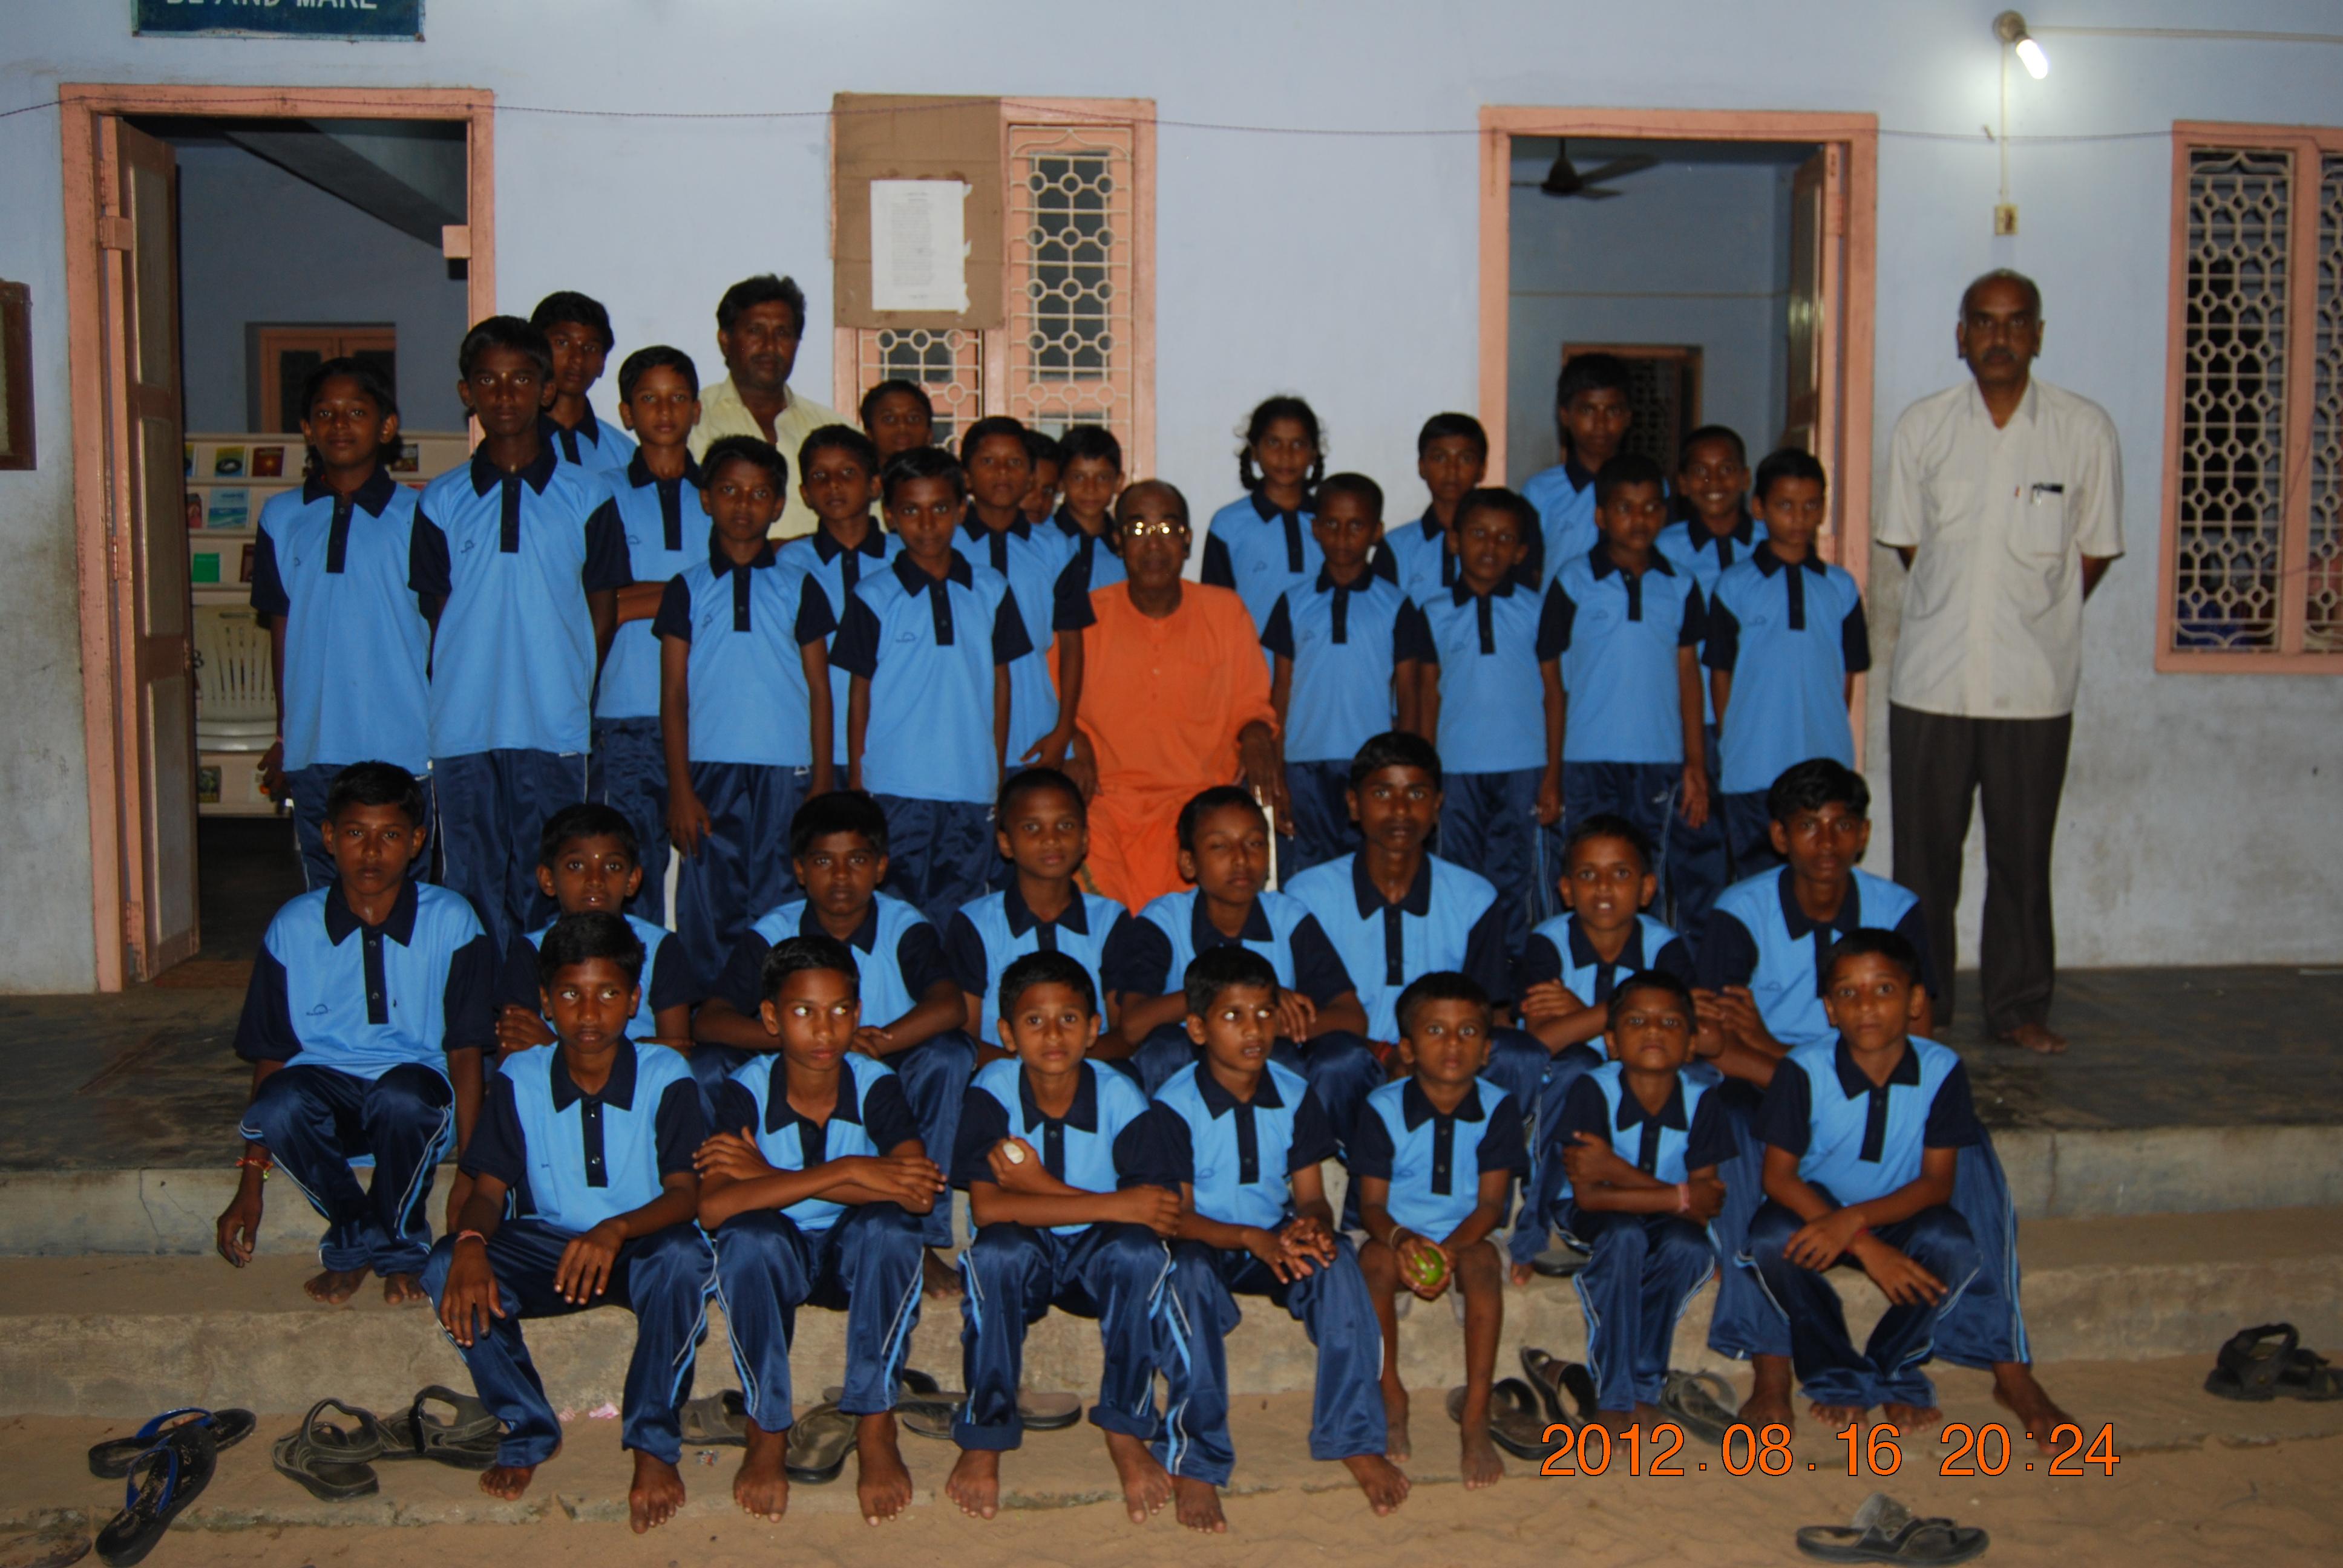 Some of the children with dresses for doing yoga asanas with Rev. Swami Aksharatmanandaji Maharaj.